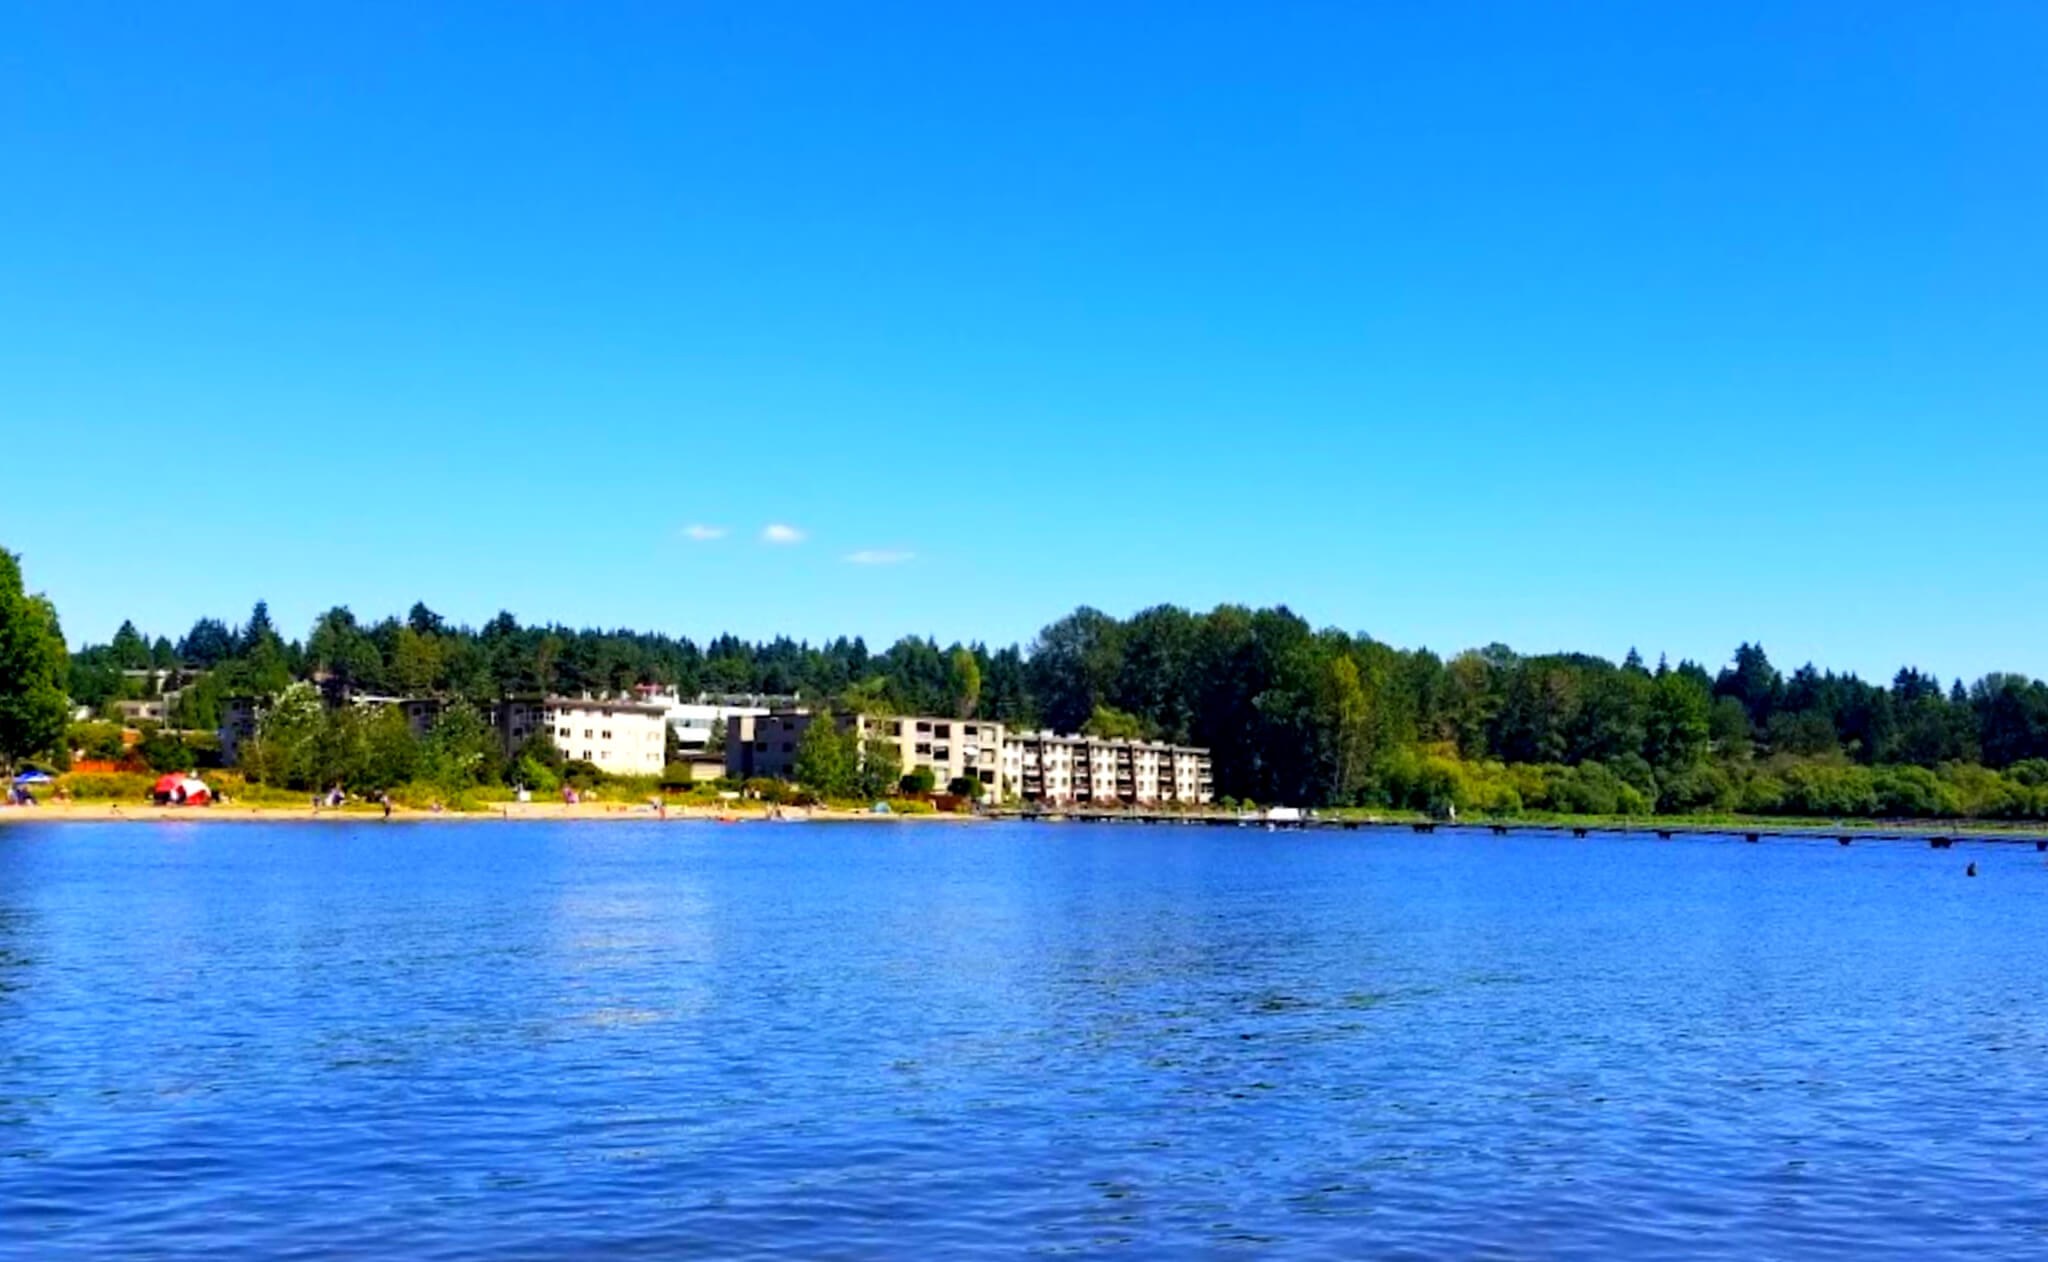 Washington-Lake-Fishing-Report-Guide-WA-06